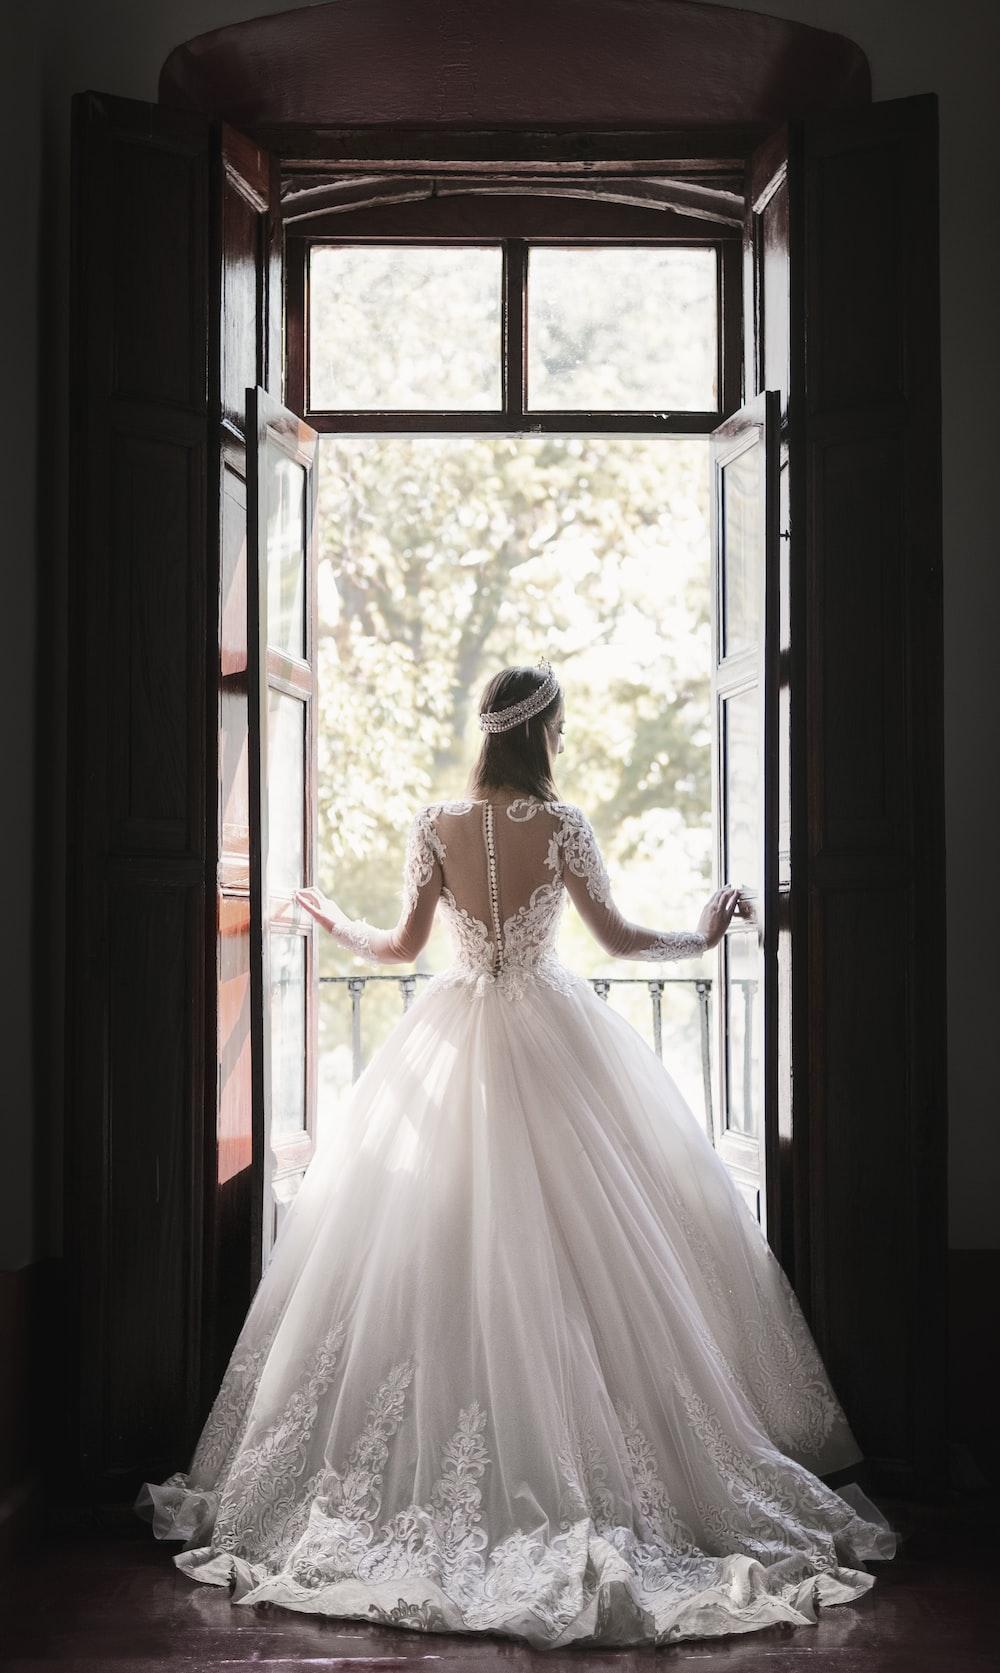 woman in white wedding dress standing near window during daytime